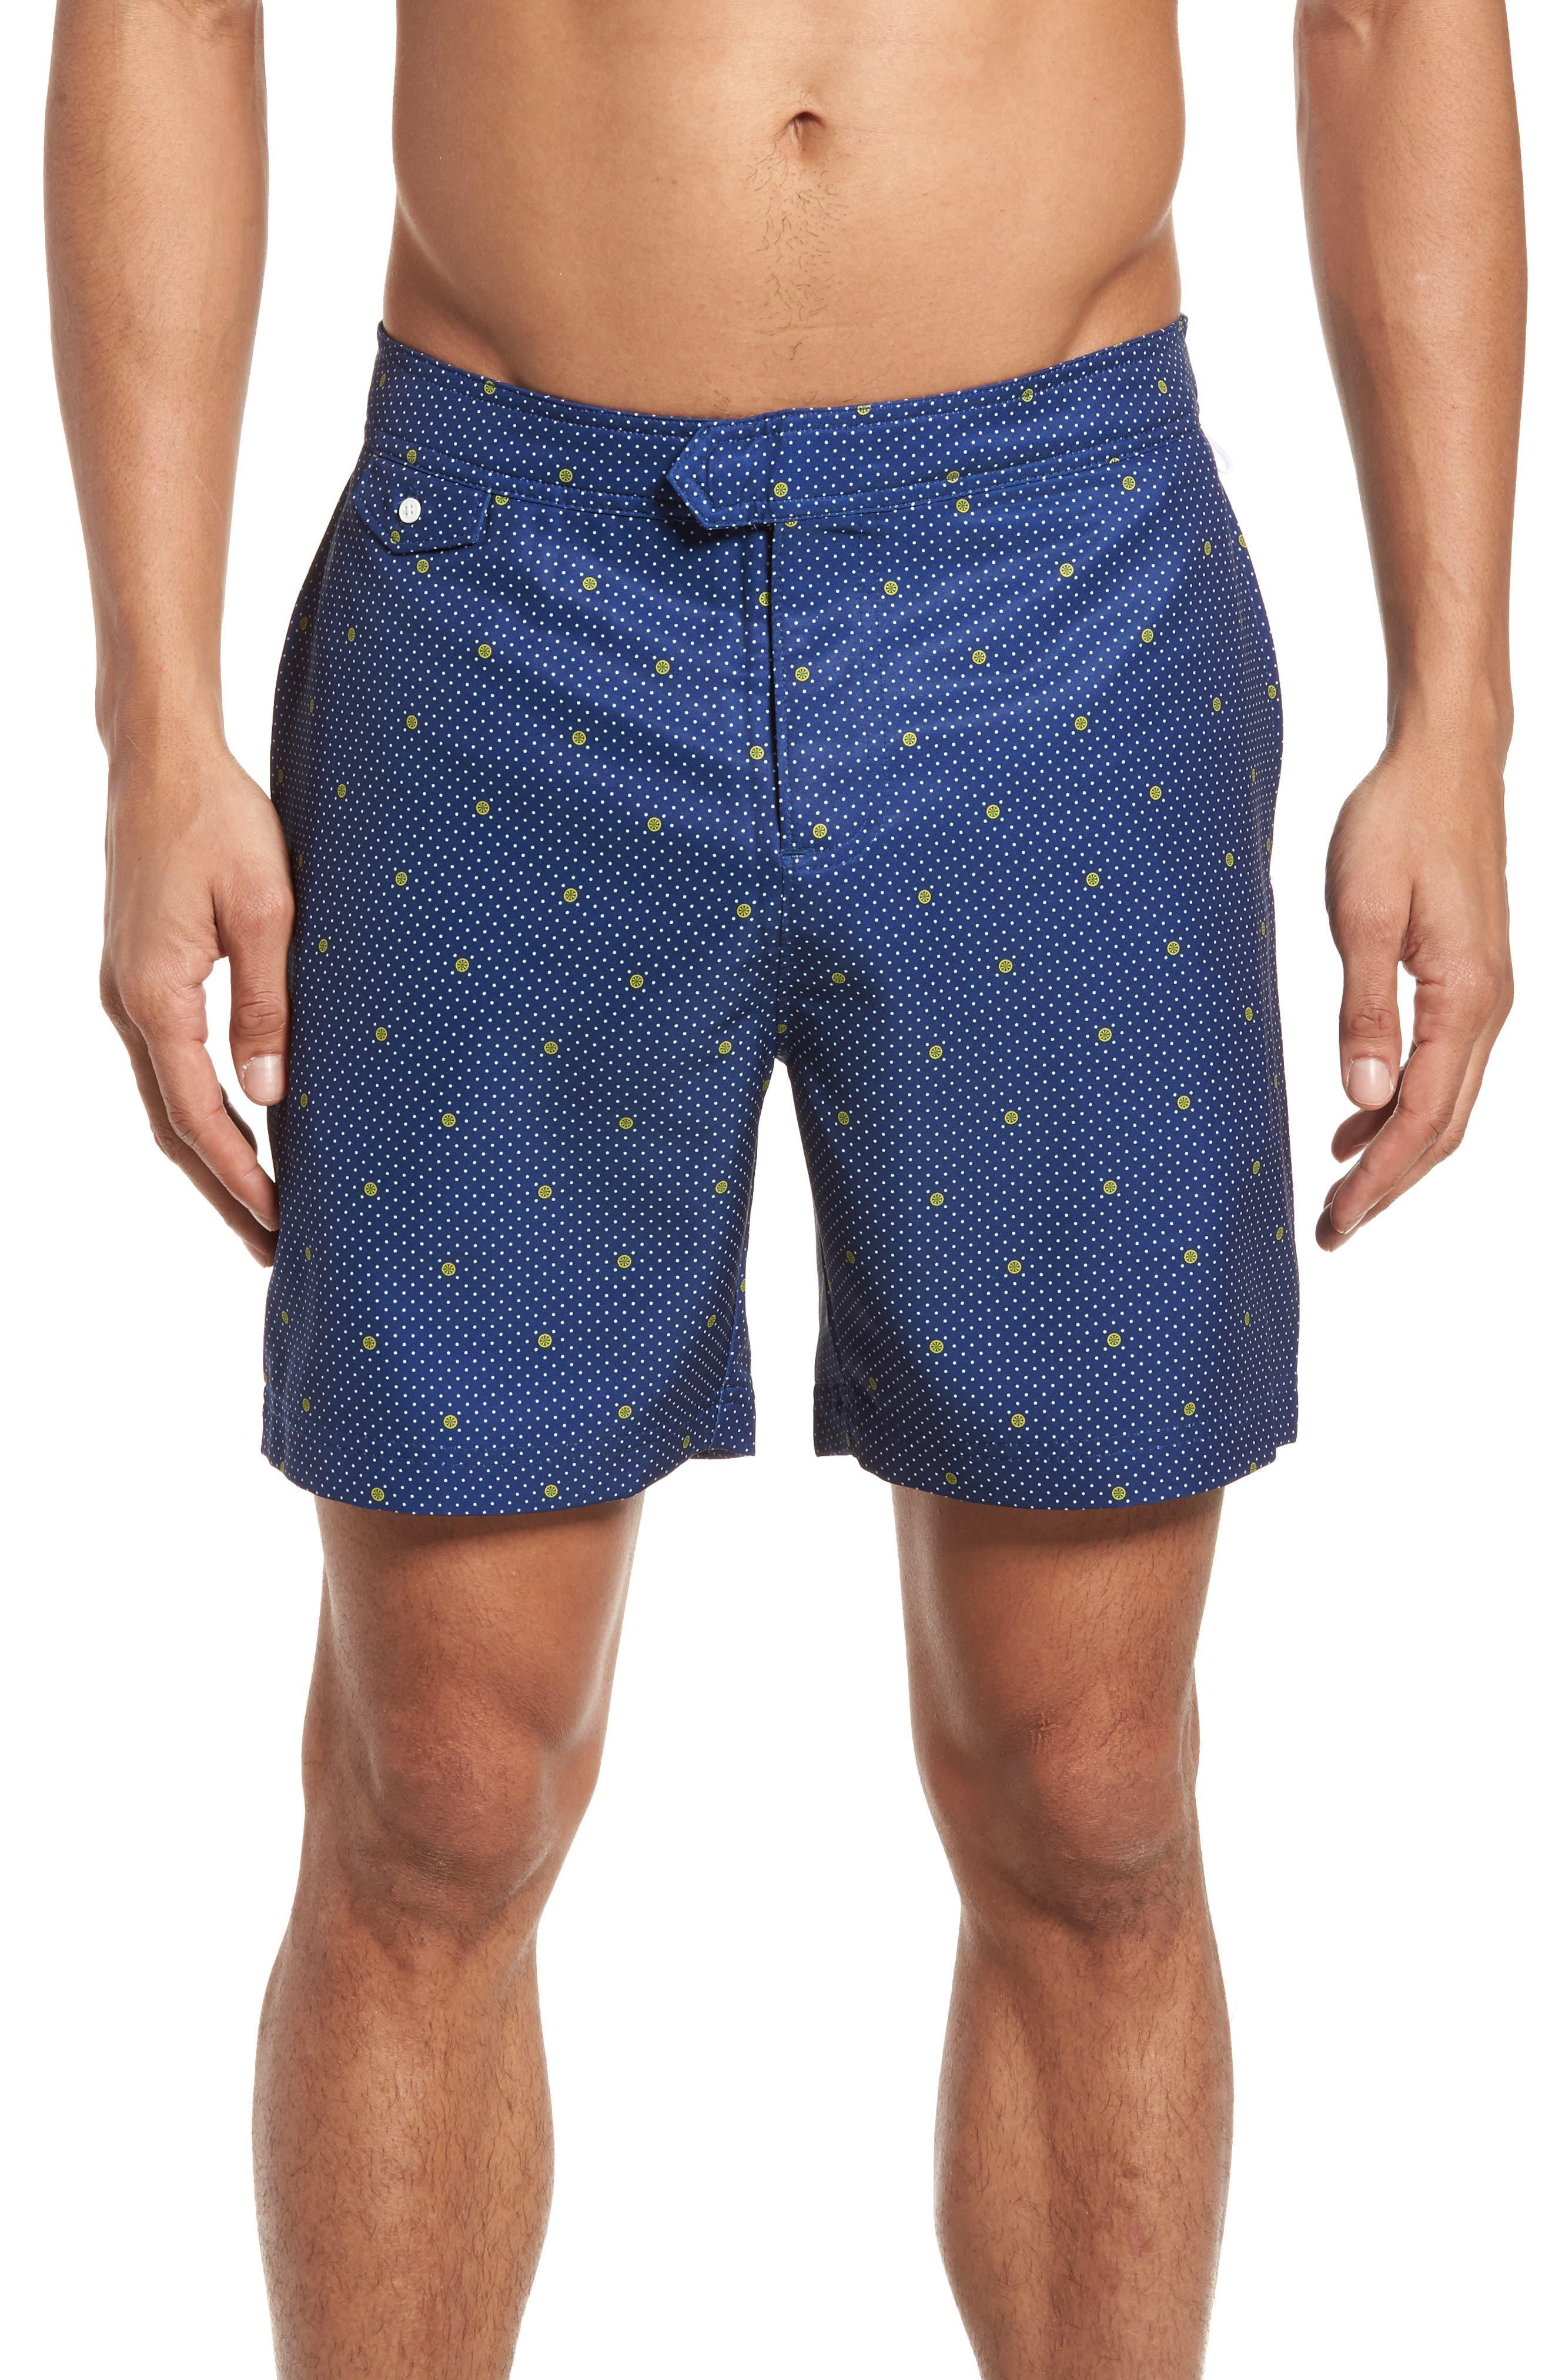 Alternate Image 1 Selected - Original Penguin Polka Dot Lemon Volley Board Shorts